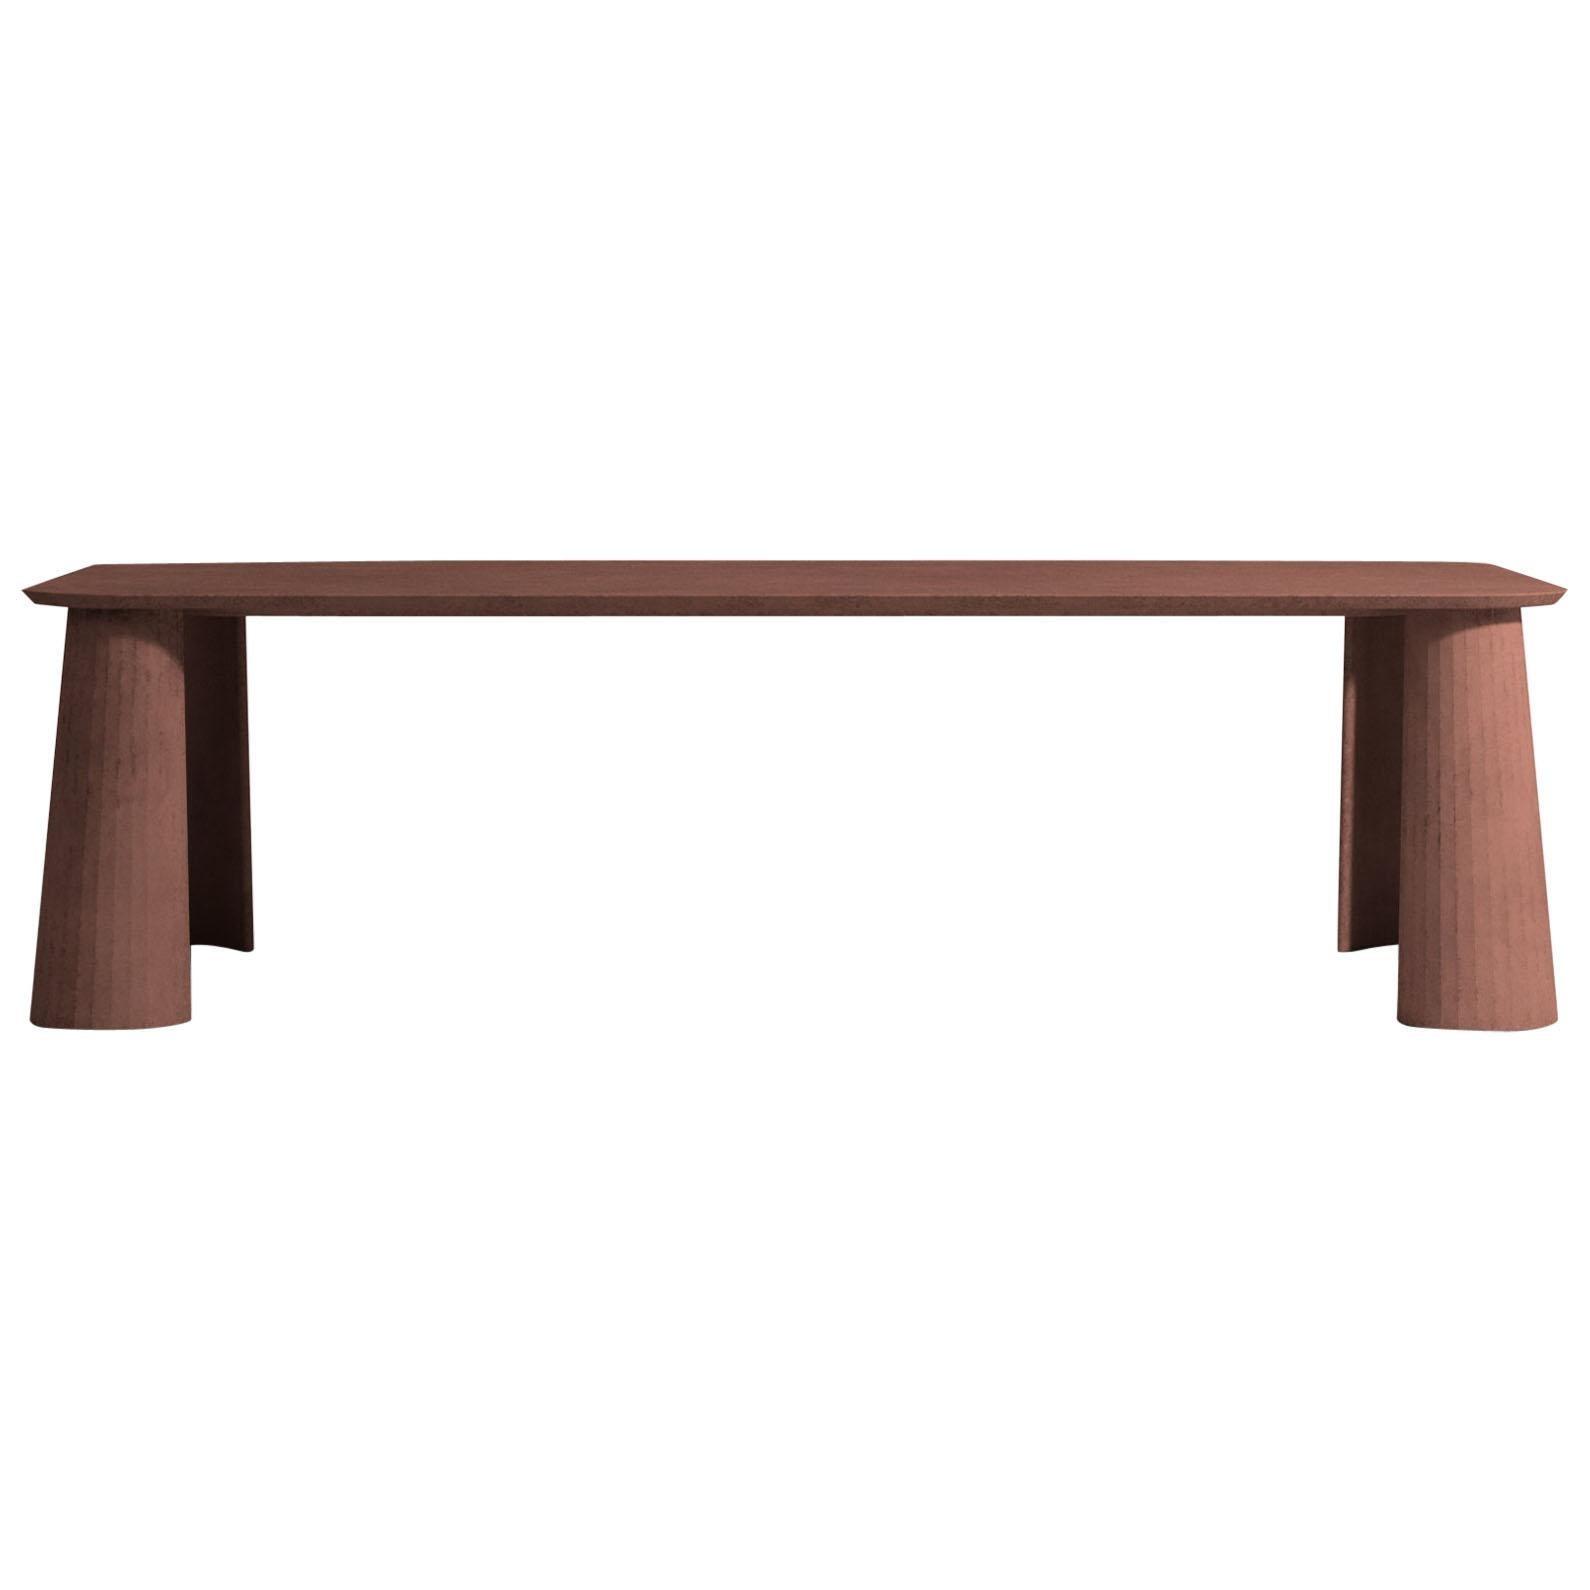 21St Century Studio Irvine Fusto Rectangular Dining Table Red Brick Cement Color